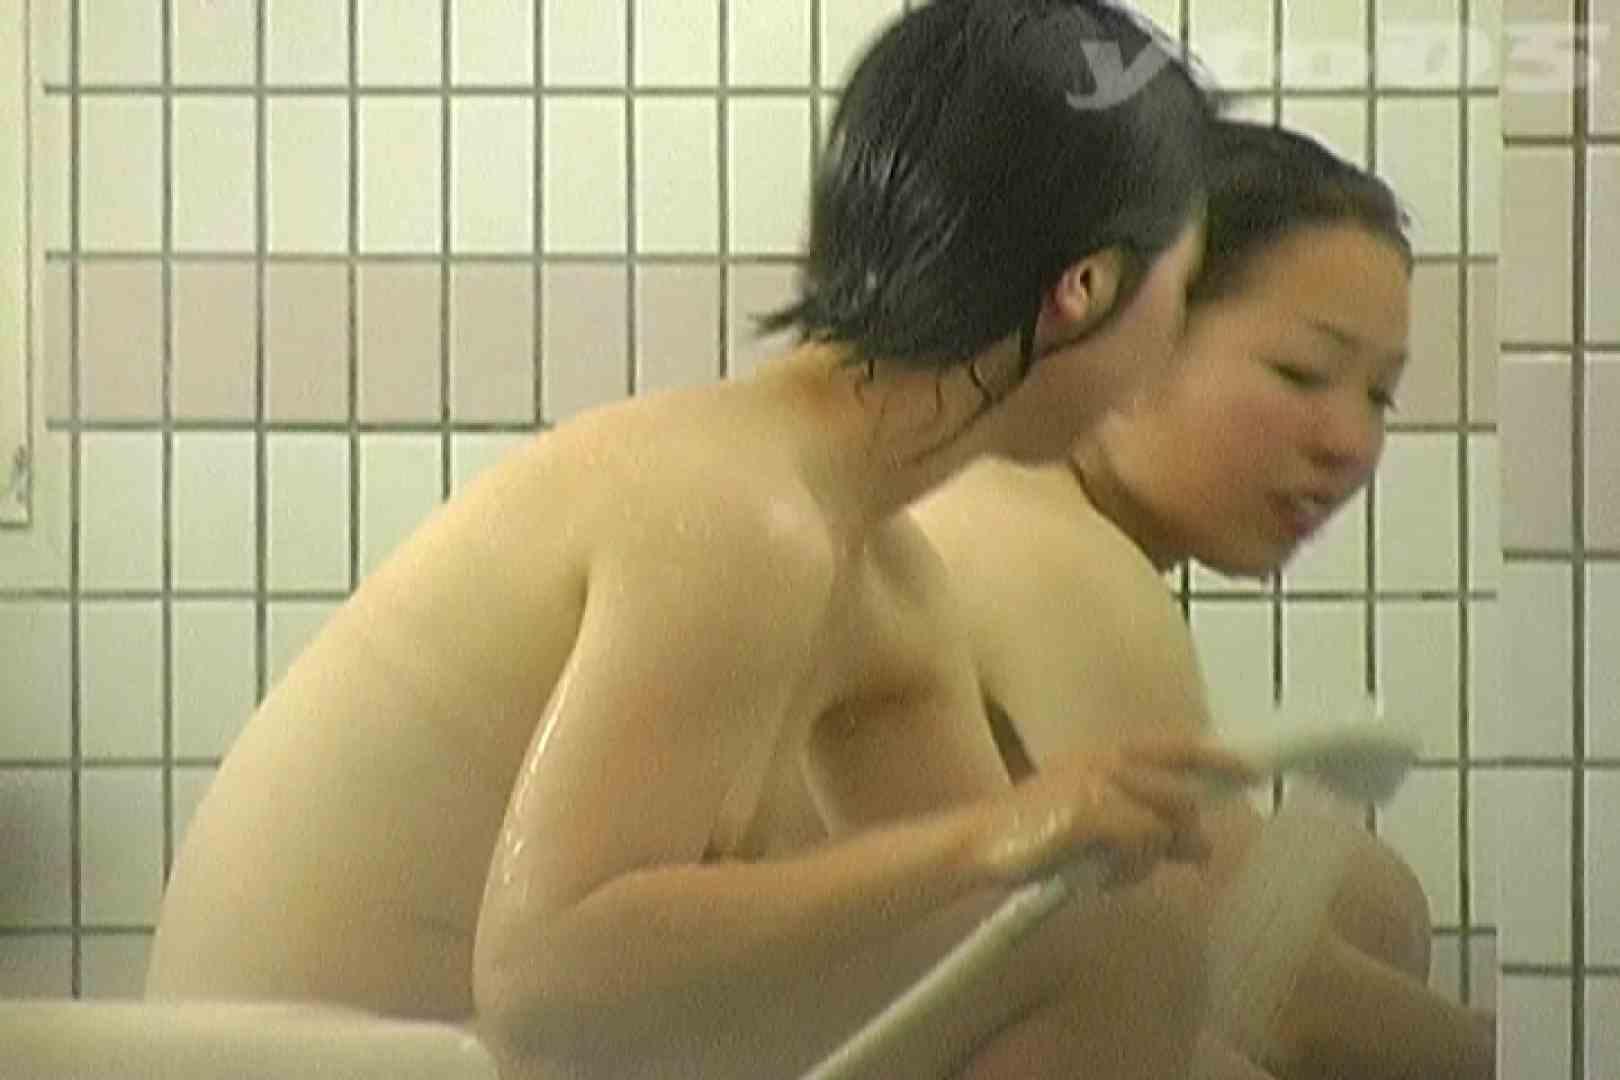 ▲復活限定▲合宿ホテル女風呂盗撮 Vol.28 女風呂 スケベ動画紹介 93枚 7